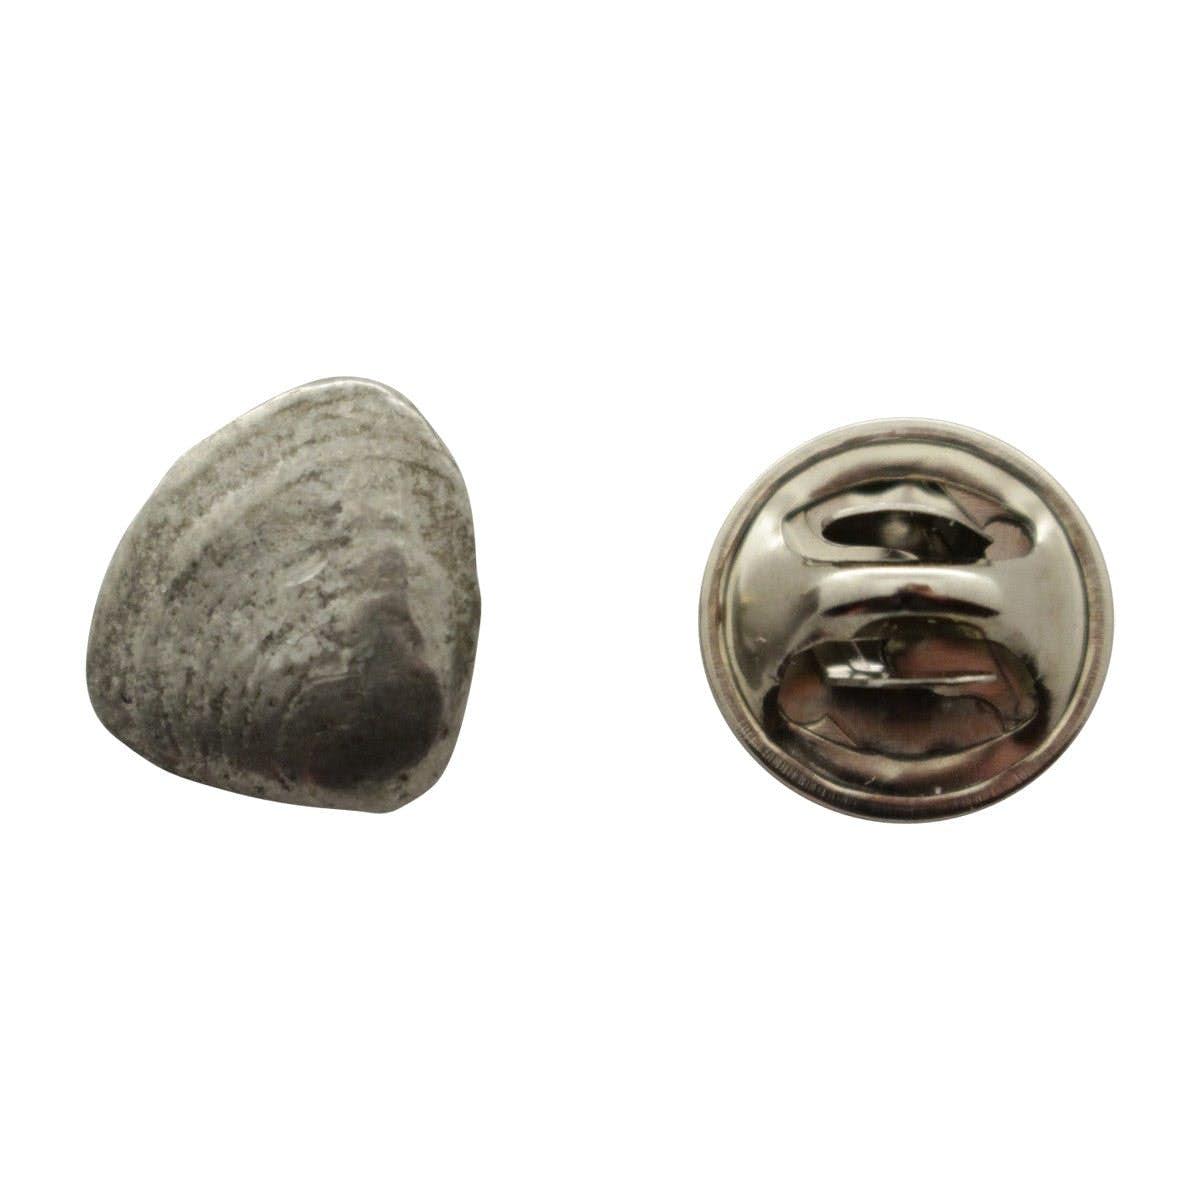 Delightful Clam Mini Pin ~ Antiqued Pewter ~ Miniature Lapel Pin ~ Antiqued Pewter  Miniature Lapel Pin